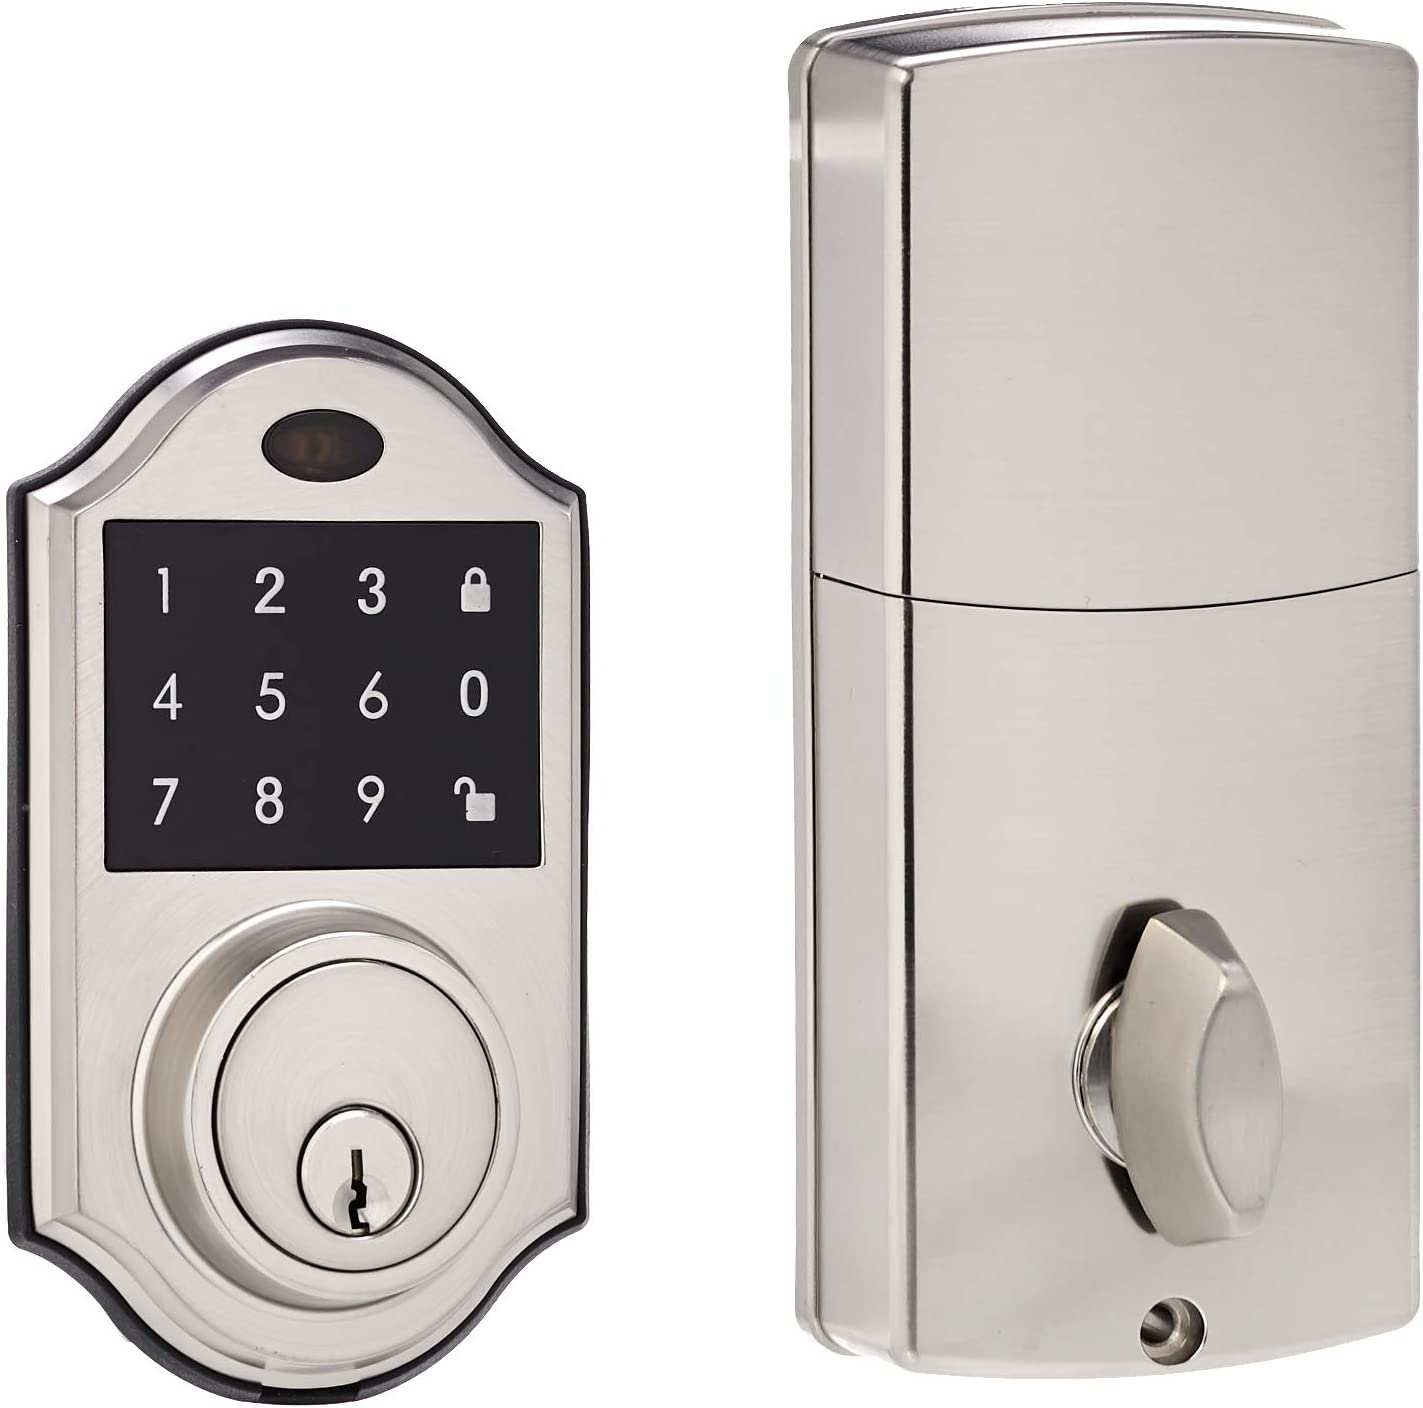 AmazonBasics Electronic Deadbolt Door Lock, Classic, Satin Nickel